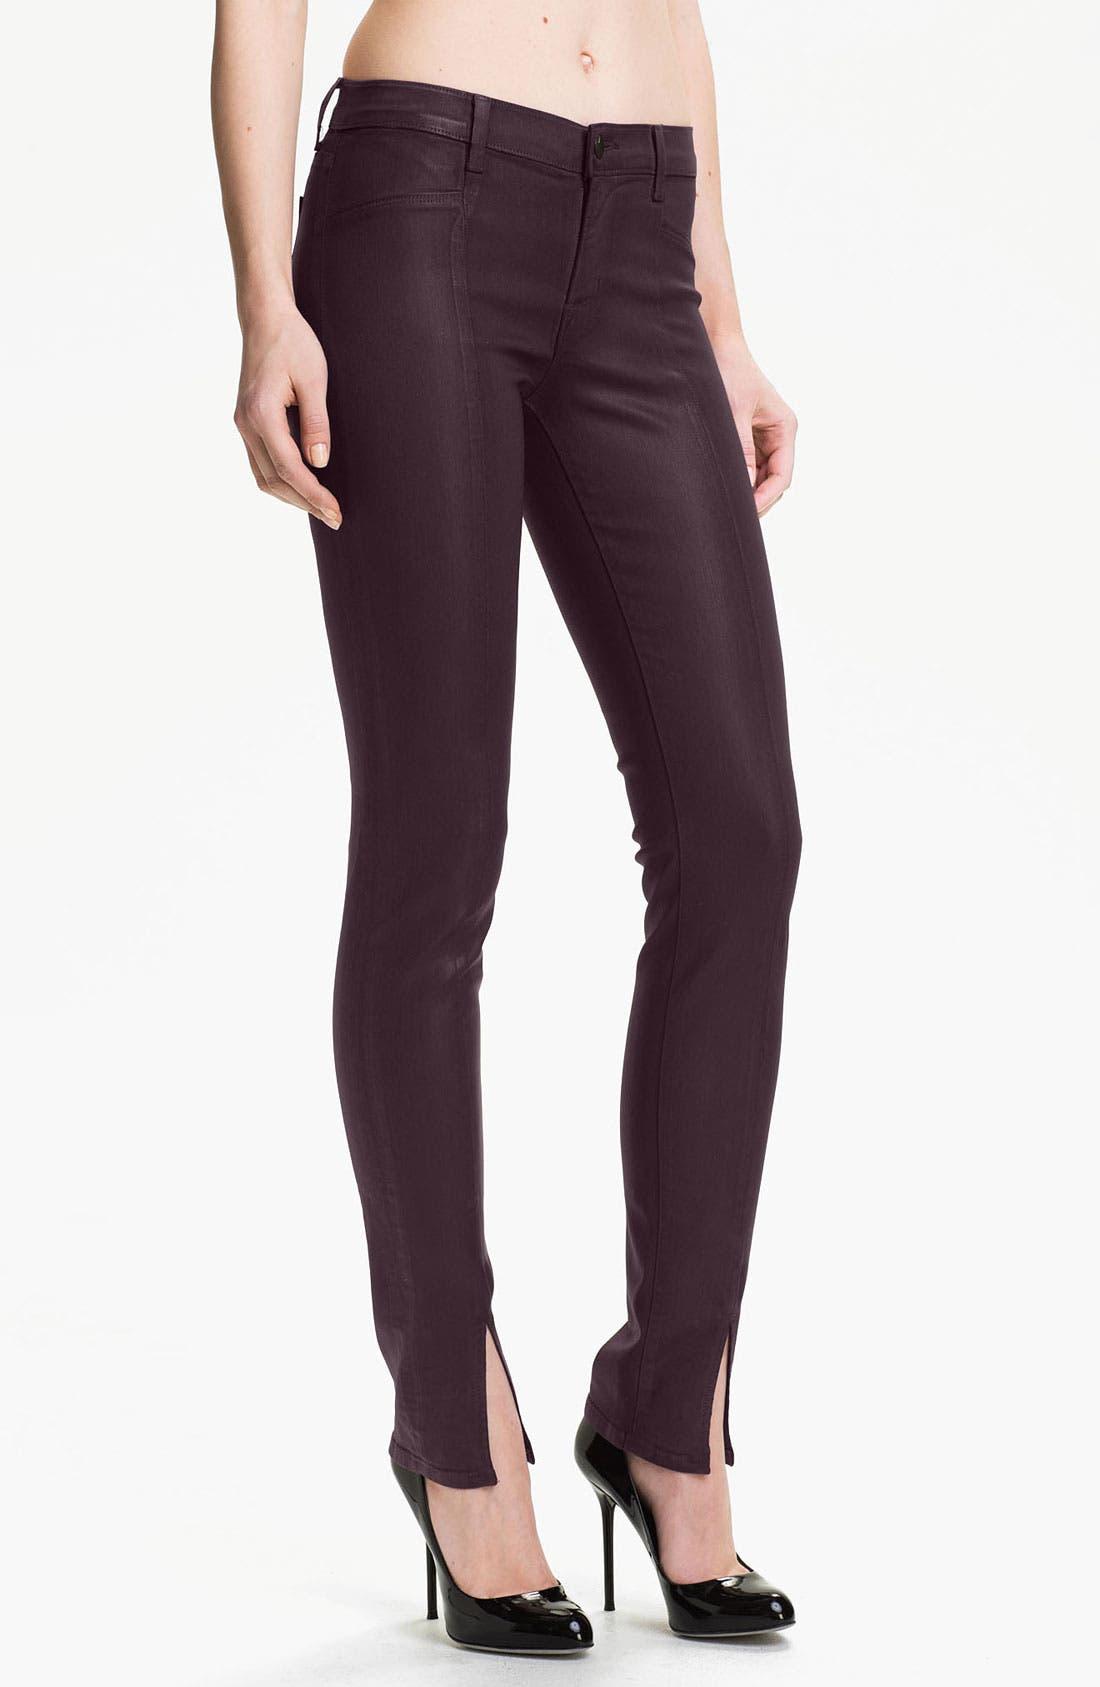 Alternate Image 1 Selected - J Brand 'Vera' Slit Hem Skinny Jeans (Coated Dark)